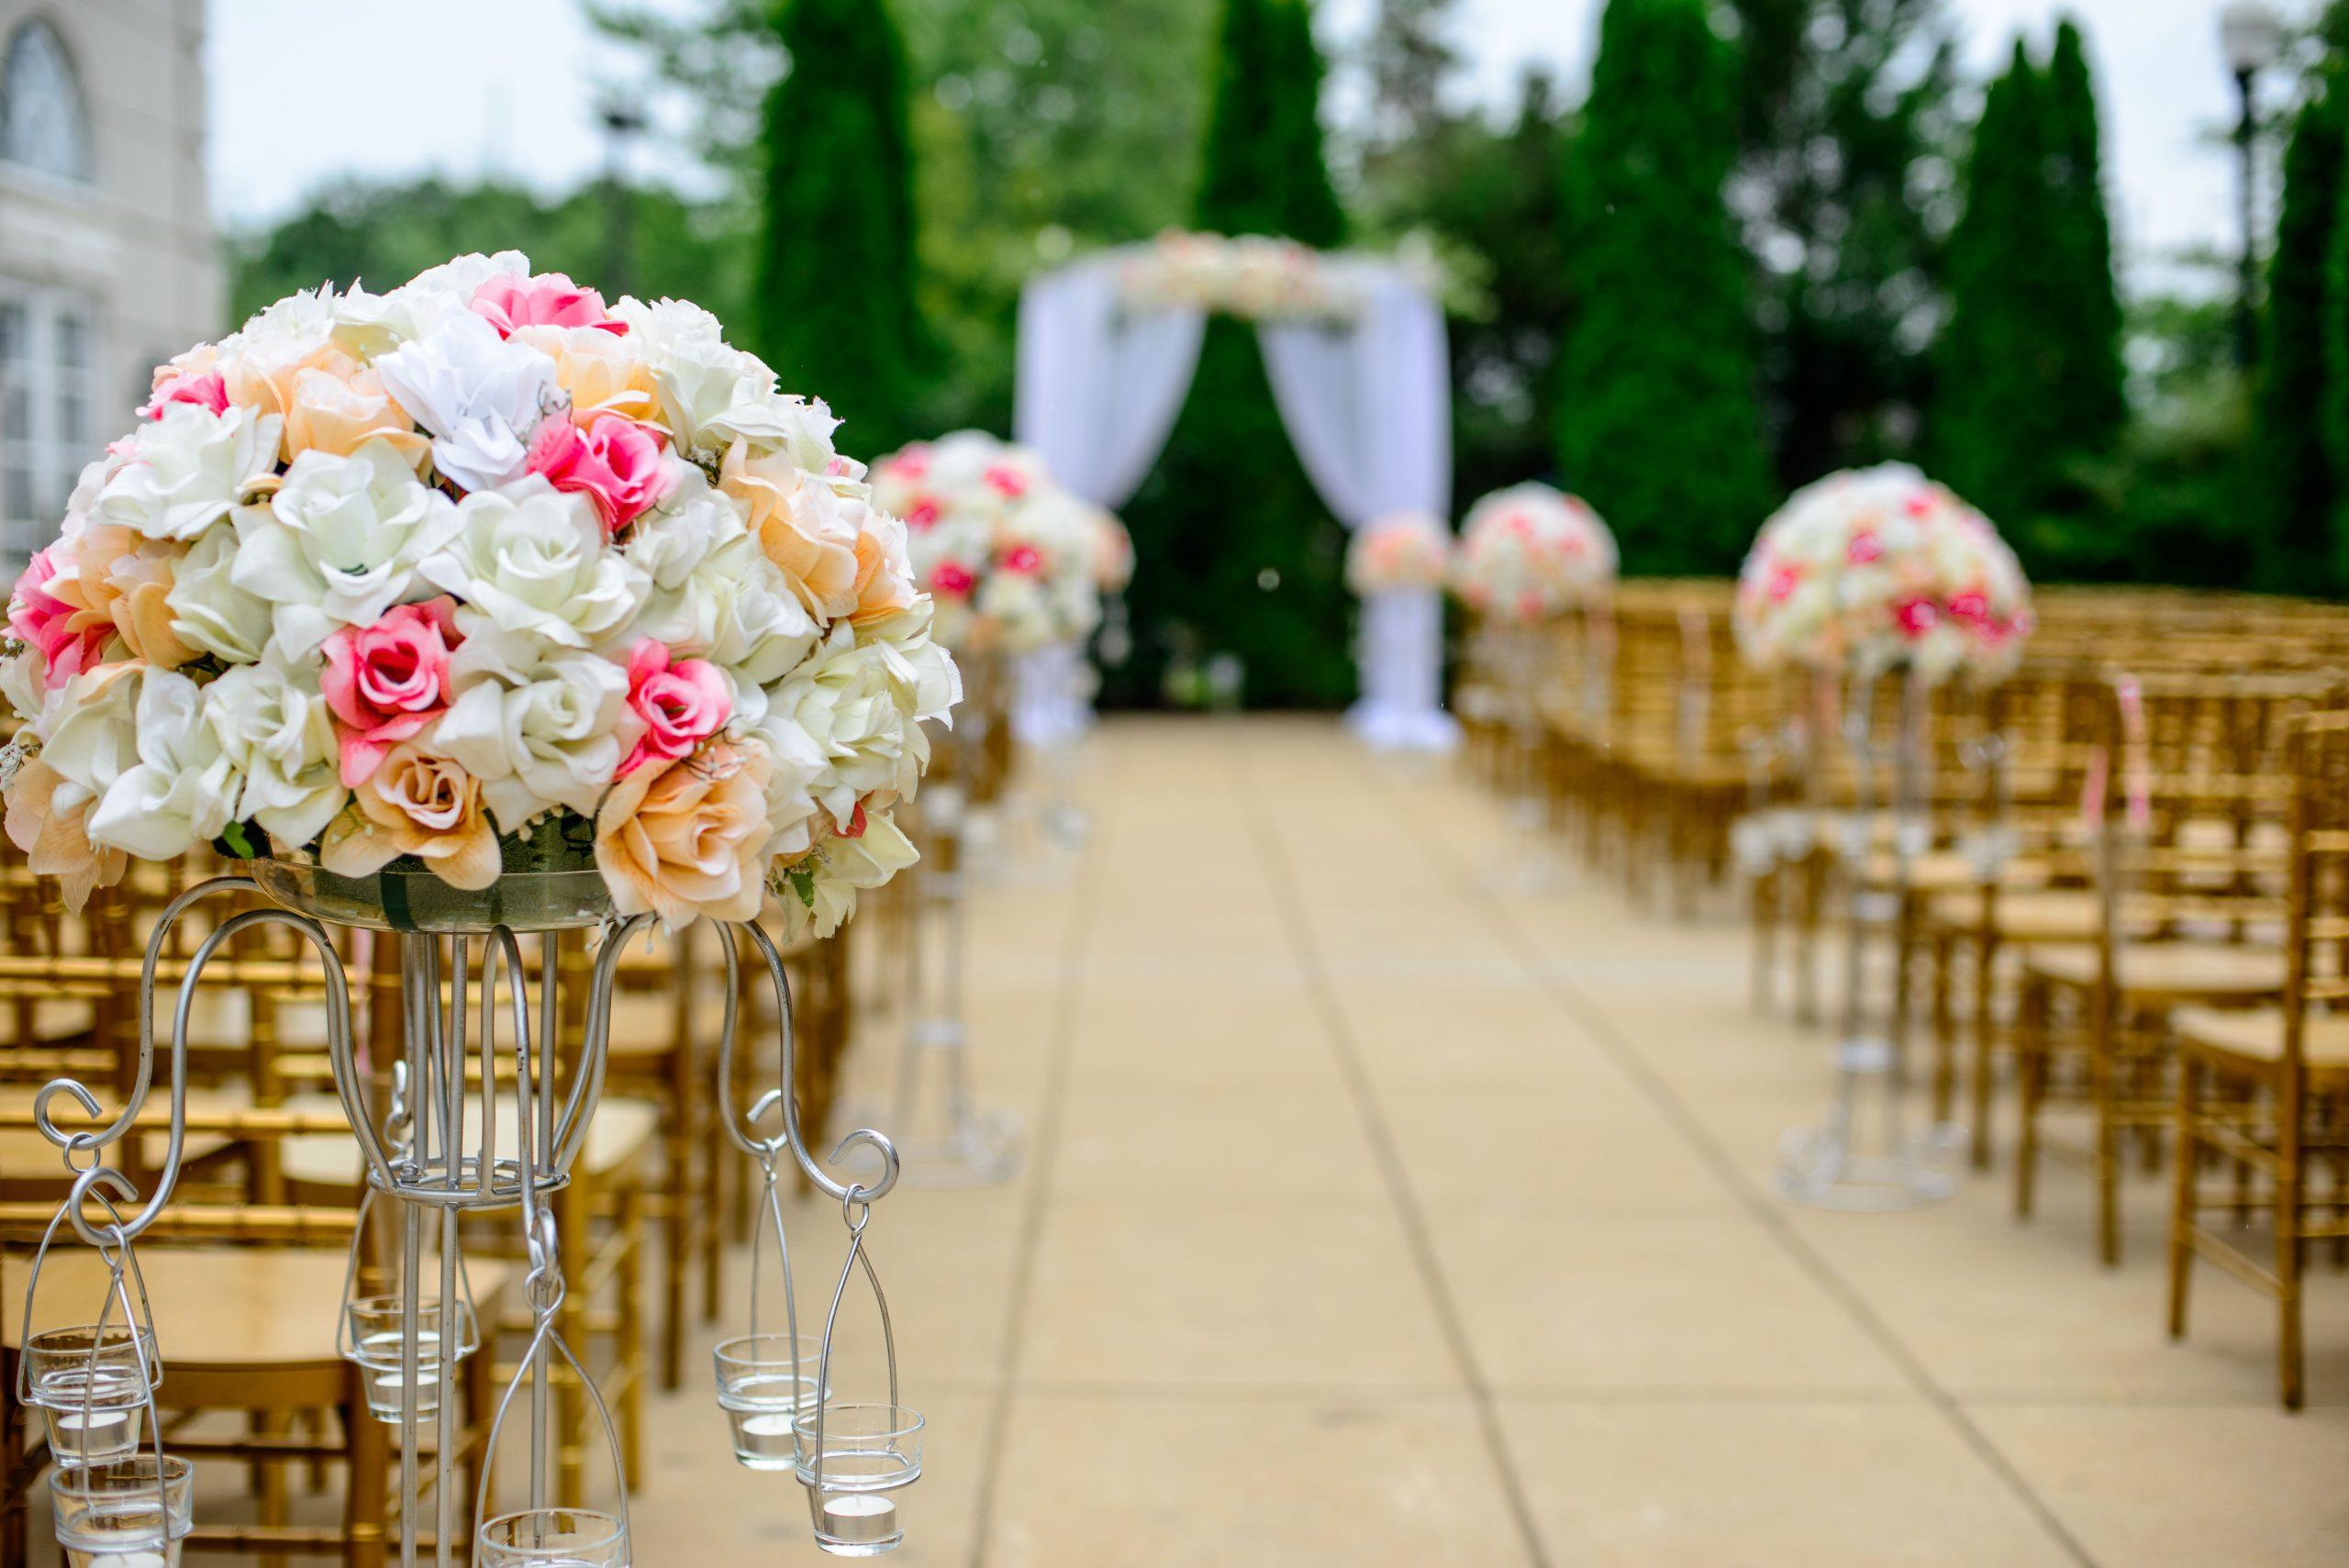 Shower and Restroom Trailer Rentals Outdoor wedding restroom trailer scaled - Weddings